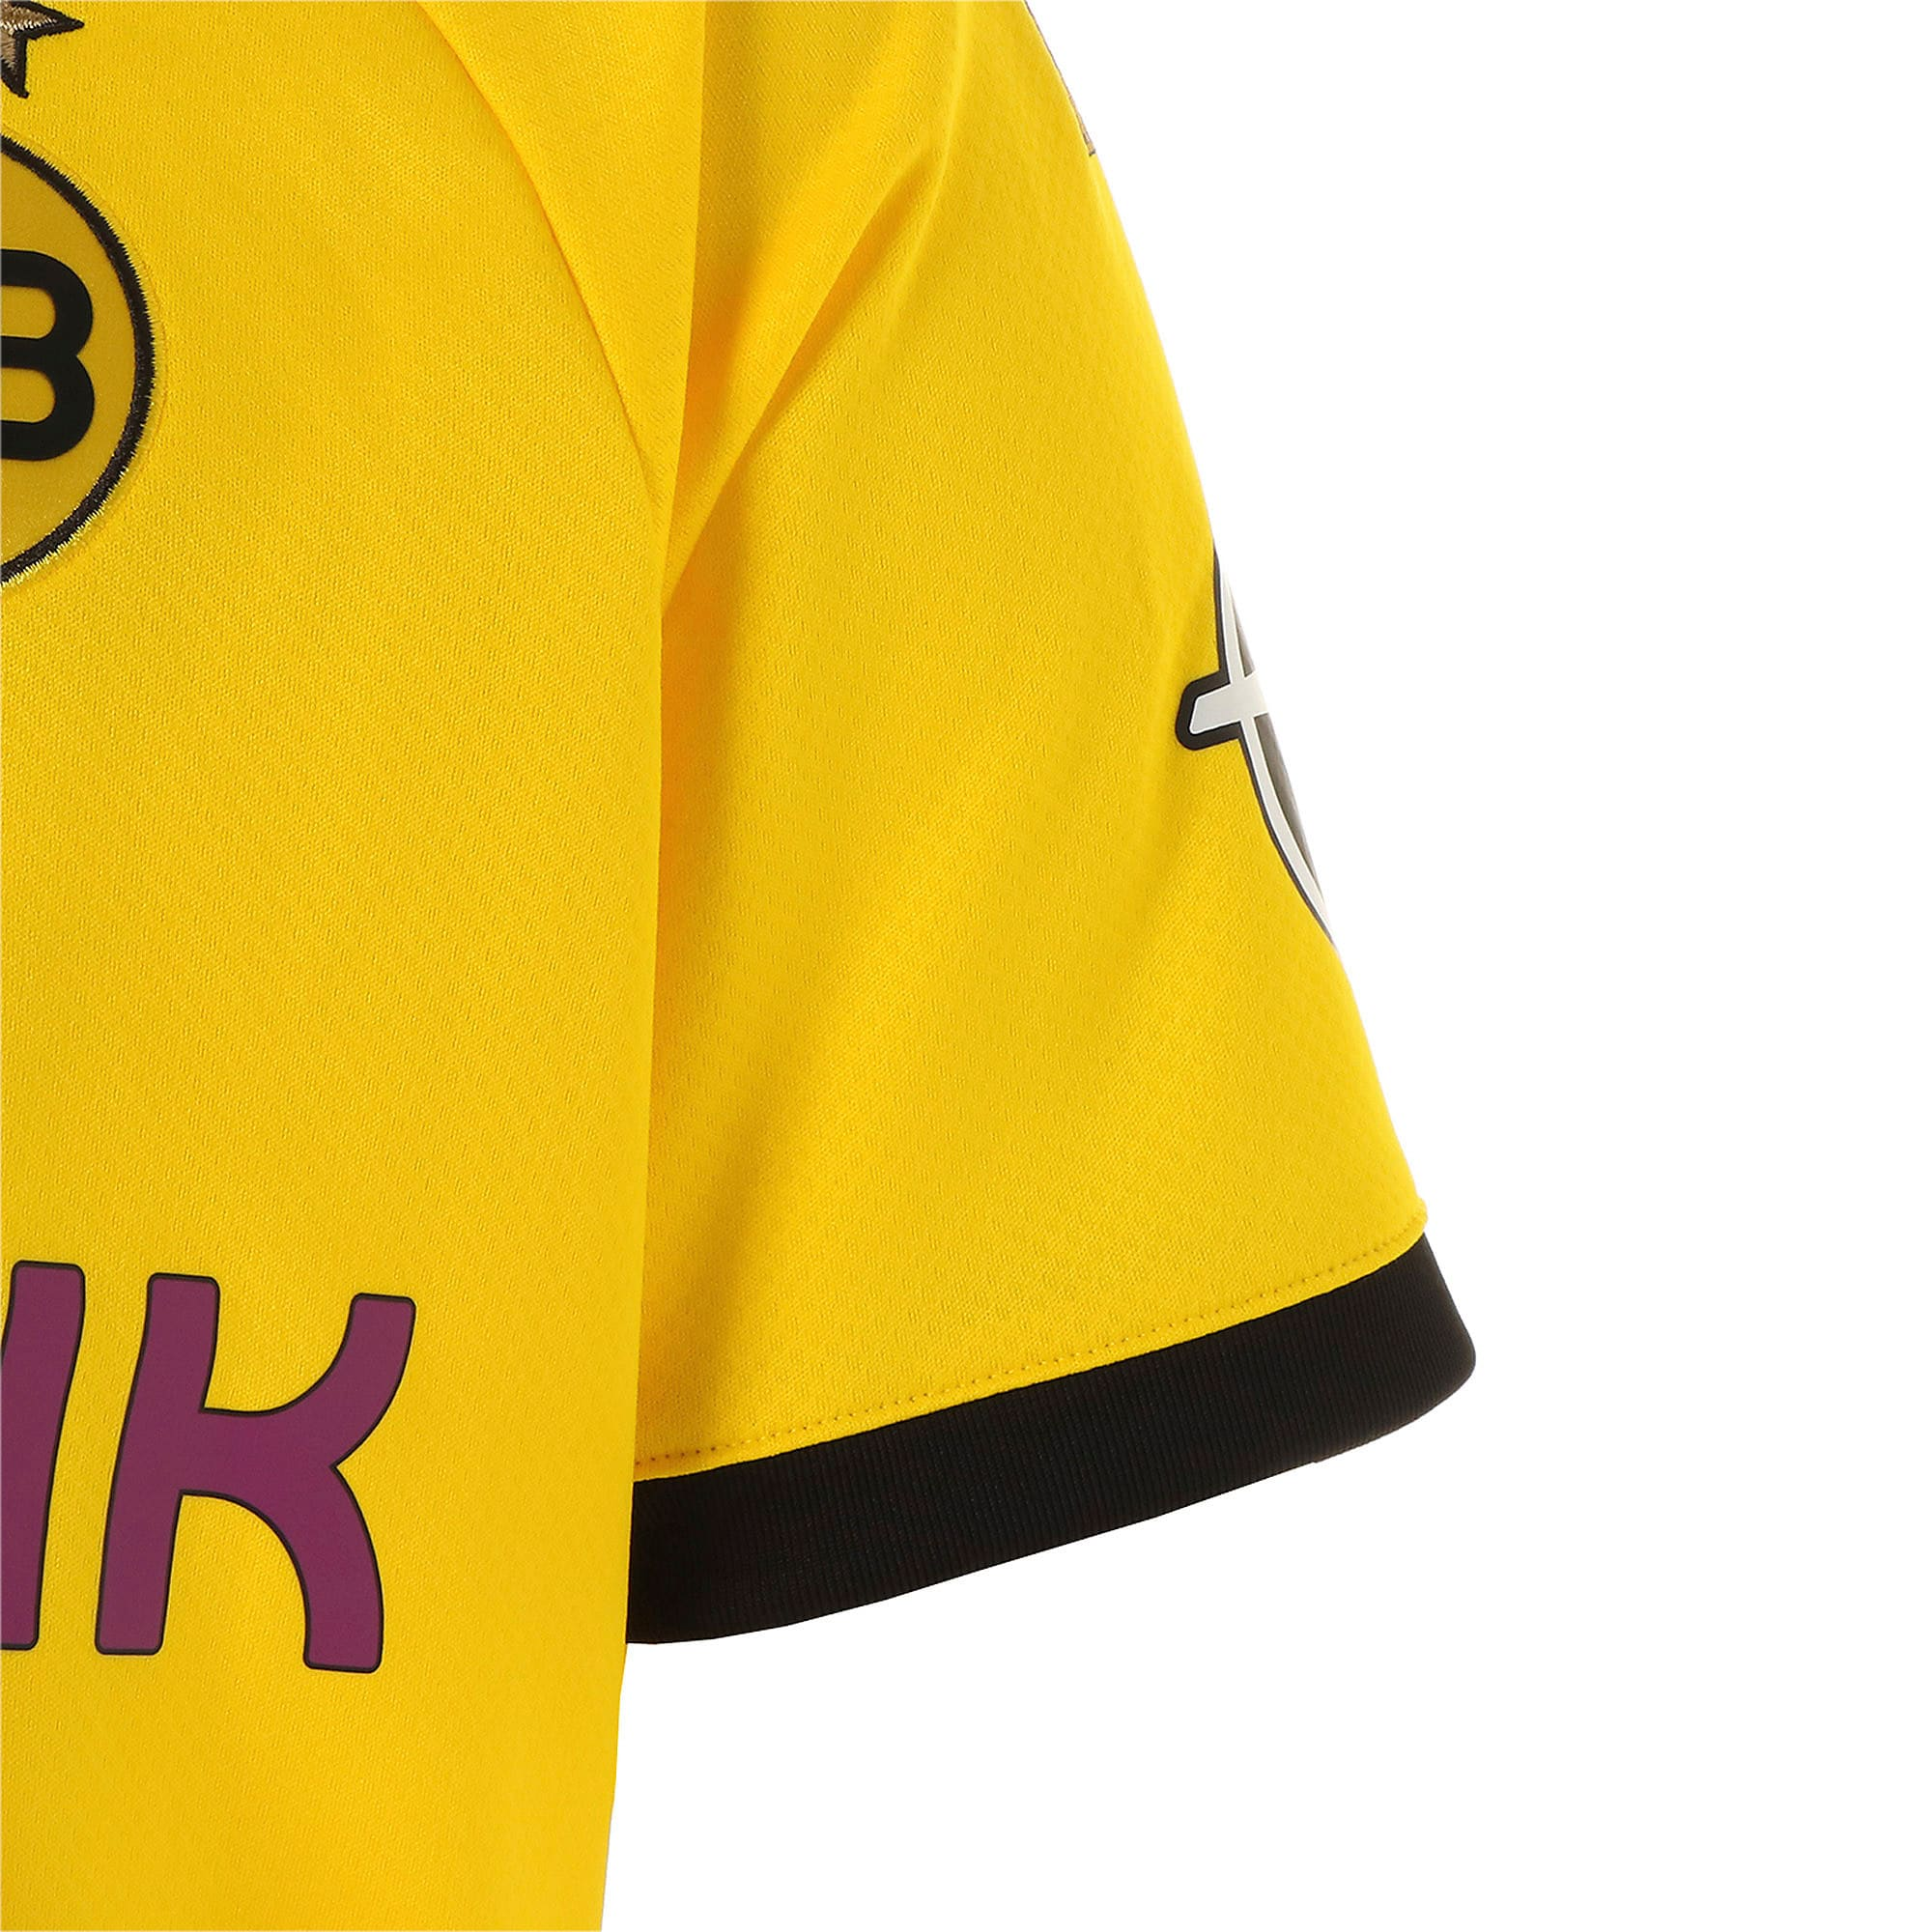 Thumbnail 5 of ドルトムント BVB SS ホーム レプリカシャツ 半袖, Cyber Yellow-Puma Black, medium-JPN